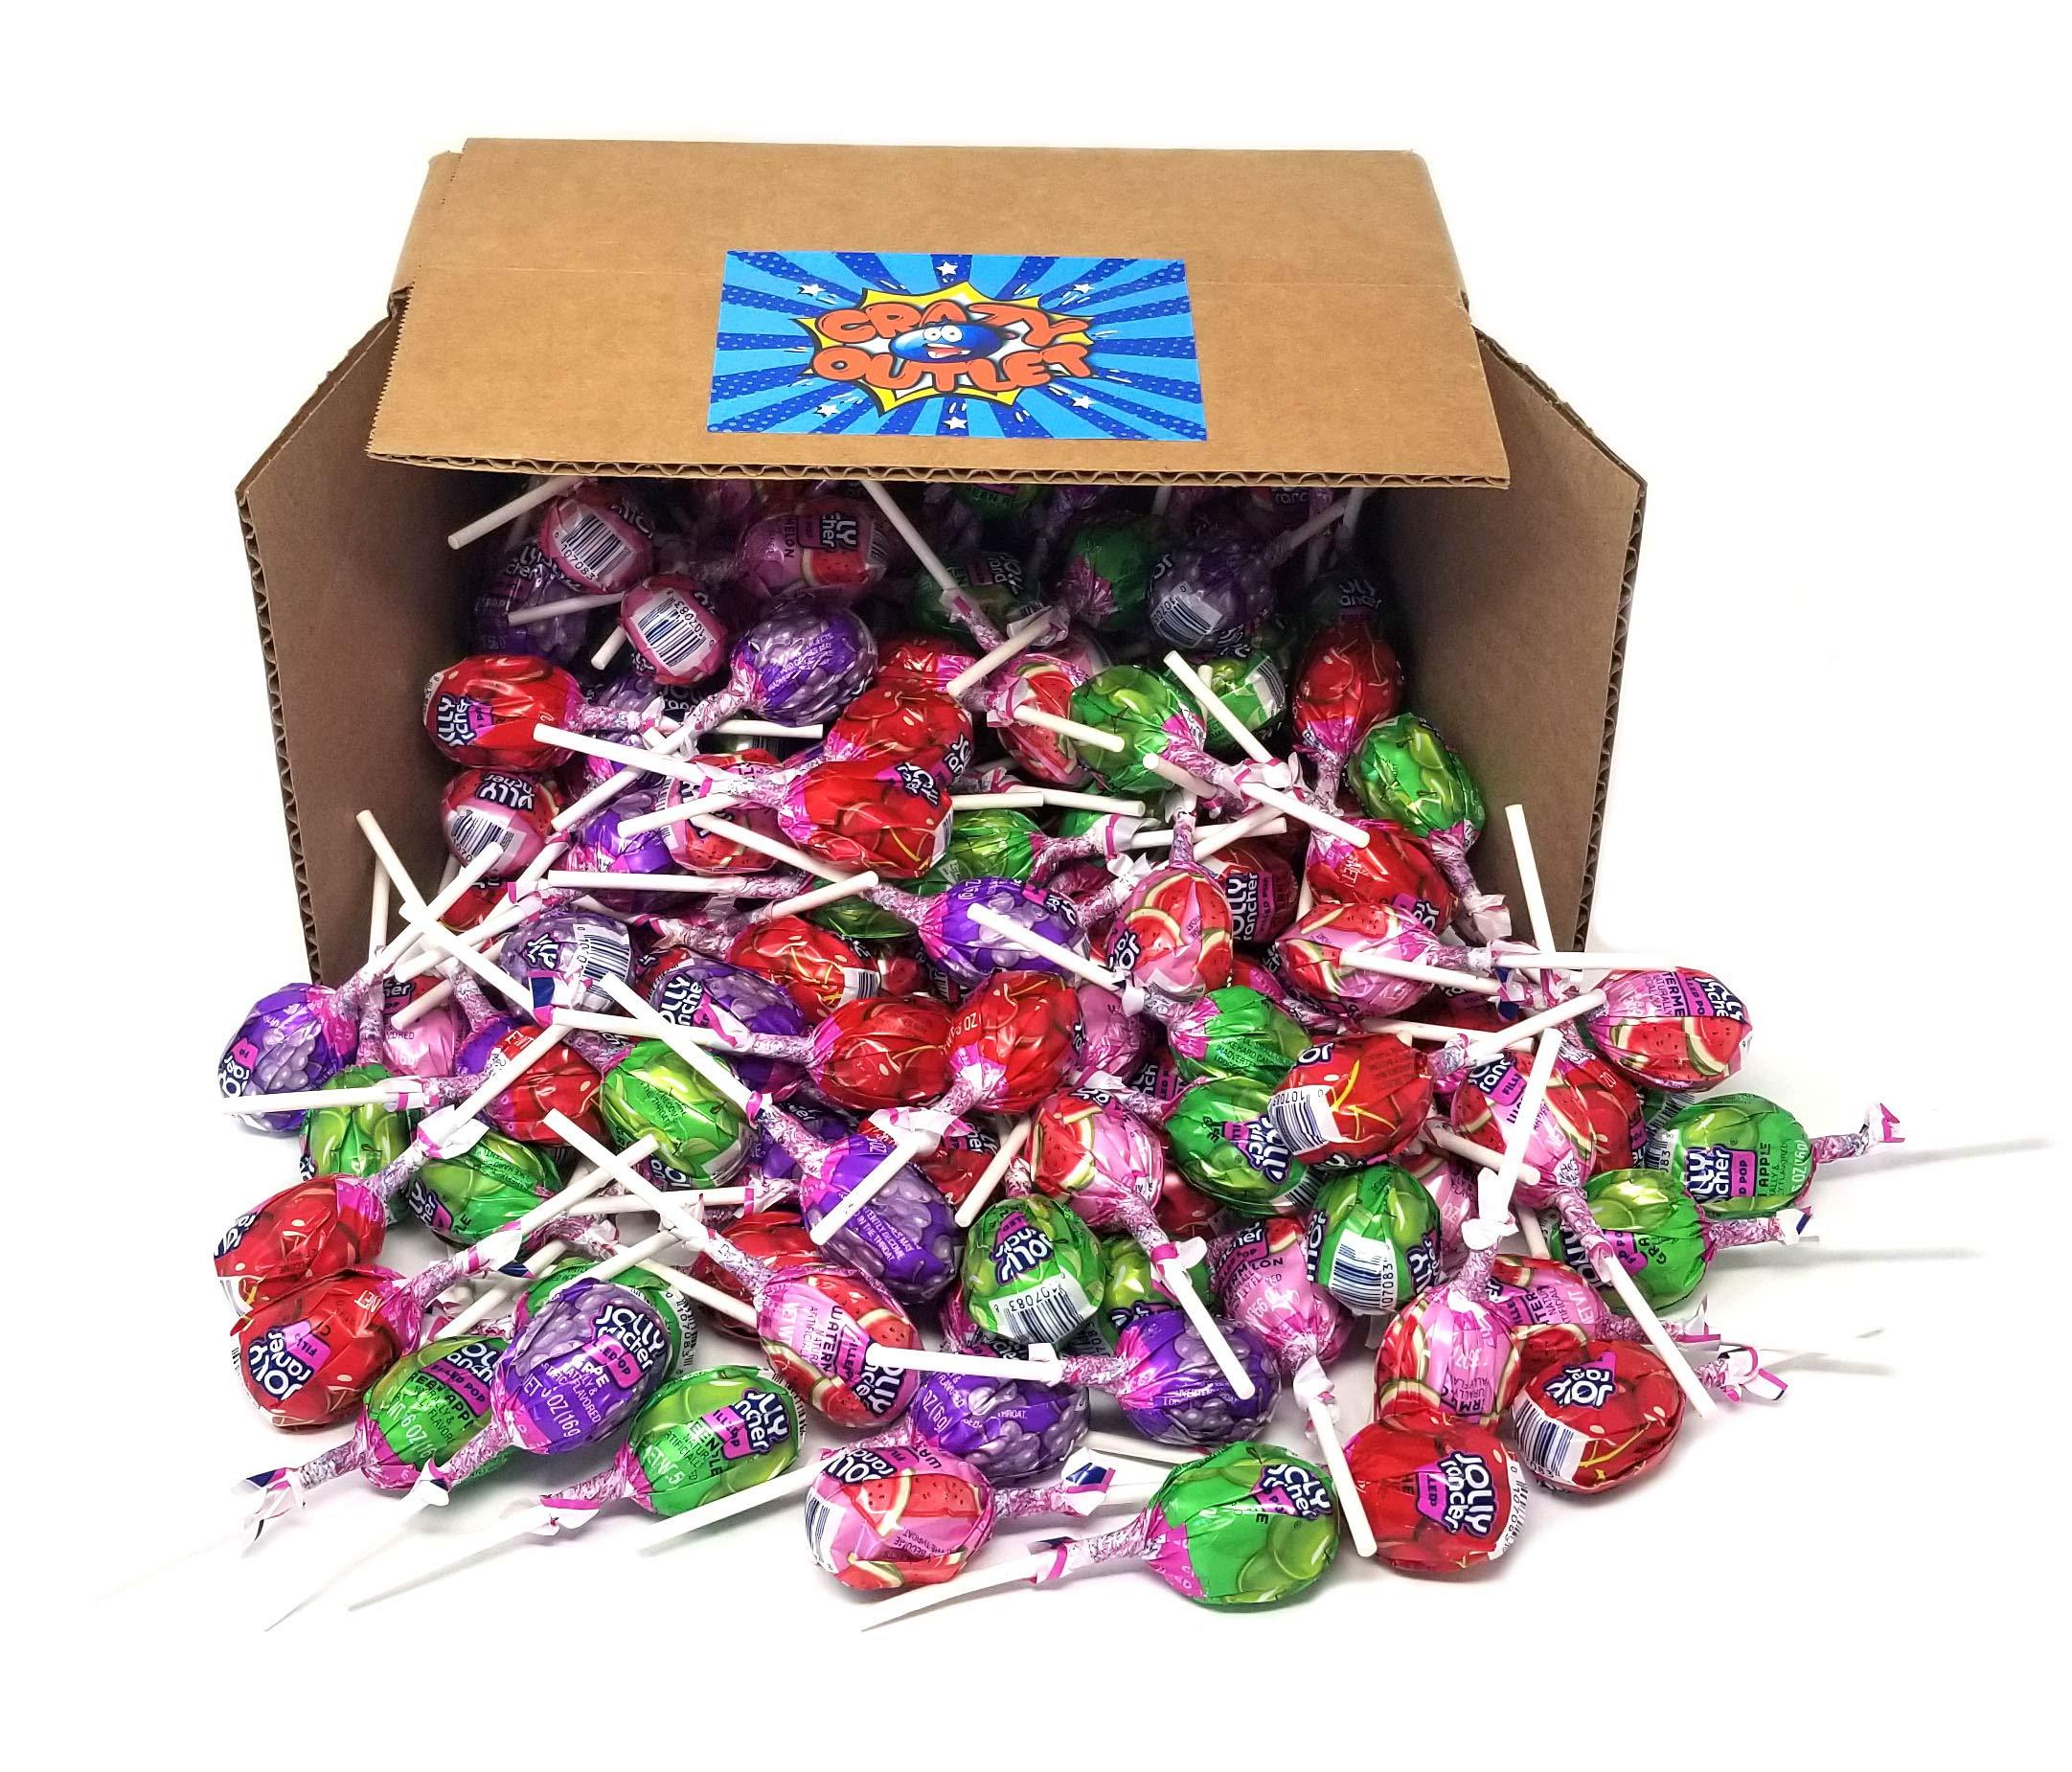 Jolly Rancher Lollipops Original Flavors, Fruit Chew Center, Hard Candy Bulk Pack, 4 lbs by HERSHEY'S